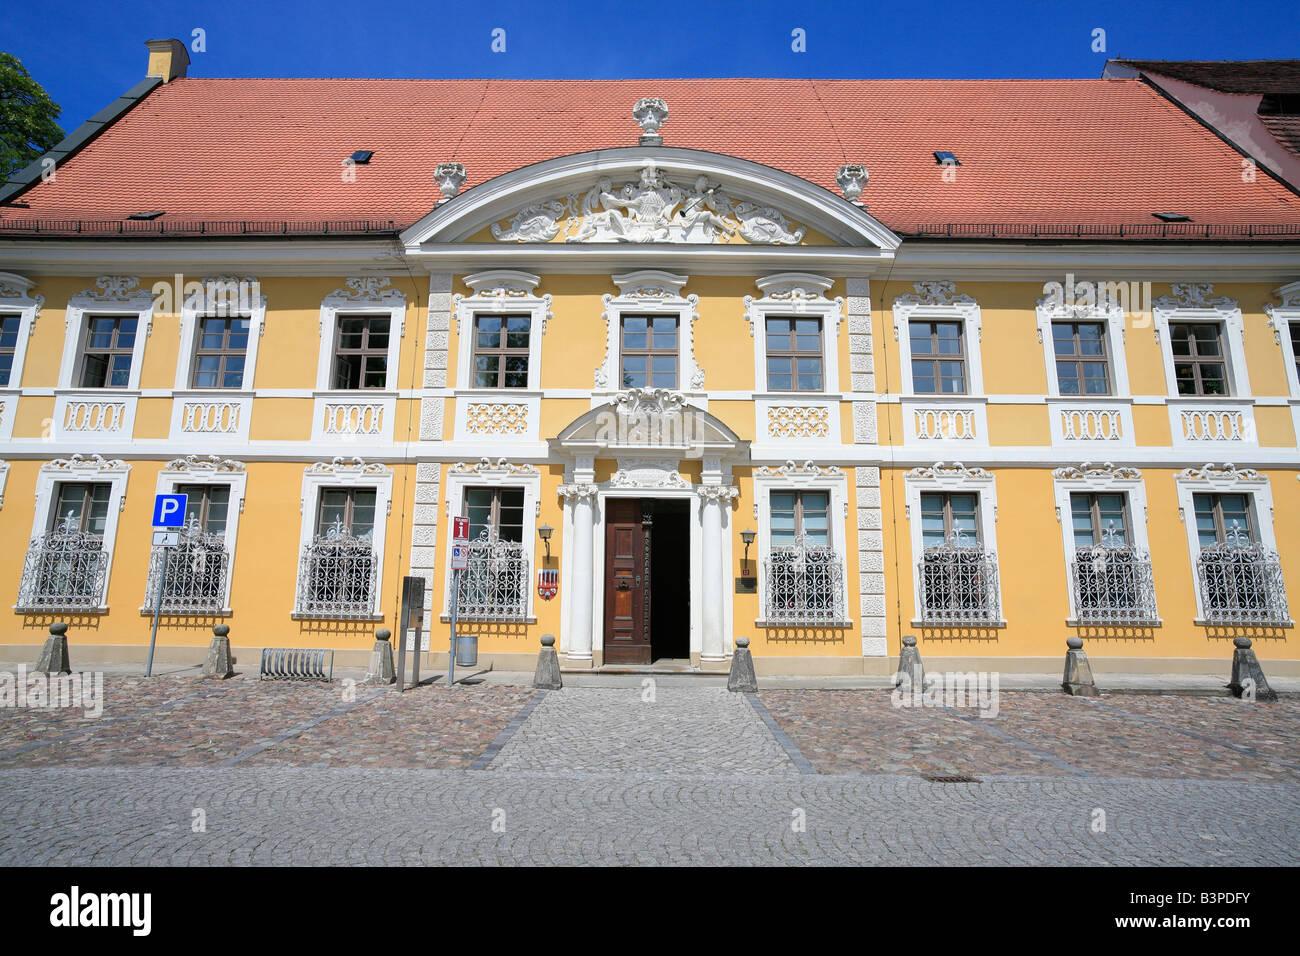 Kavalierhäuser; Kavalierhaus; Zerbst, Anhalt-Zerbst, Saxony-Anhalt, Germany Stock Photo